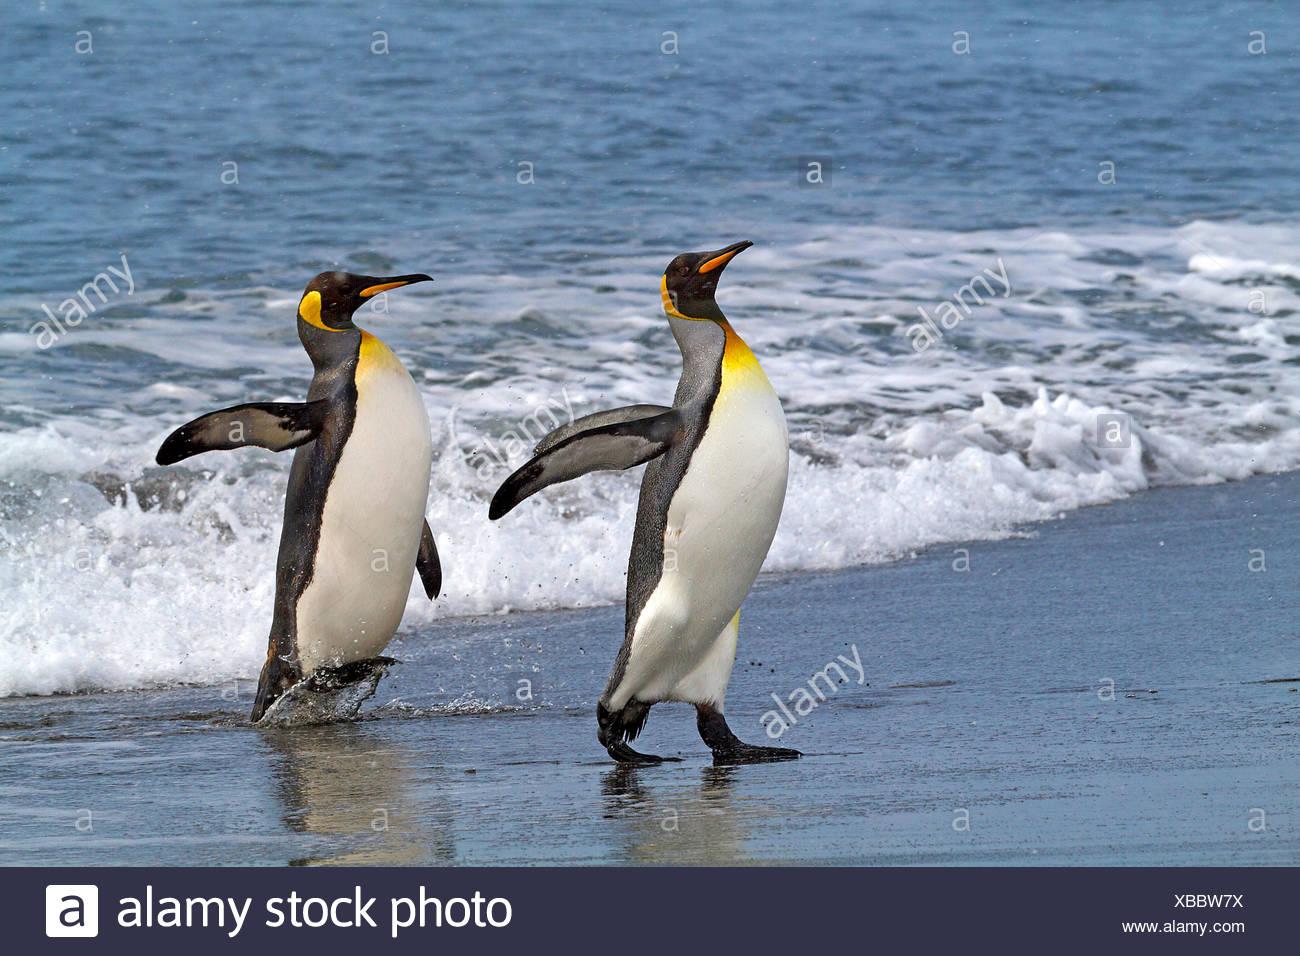 king penguin (Aptenodytes patagonicus), two king penguins going on shore, Antarctica, Suedgeorgien, St. Andrews Bay - Stock Image